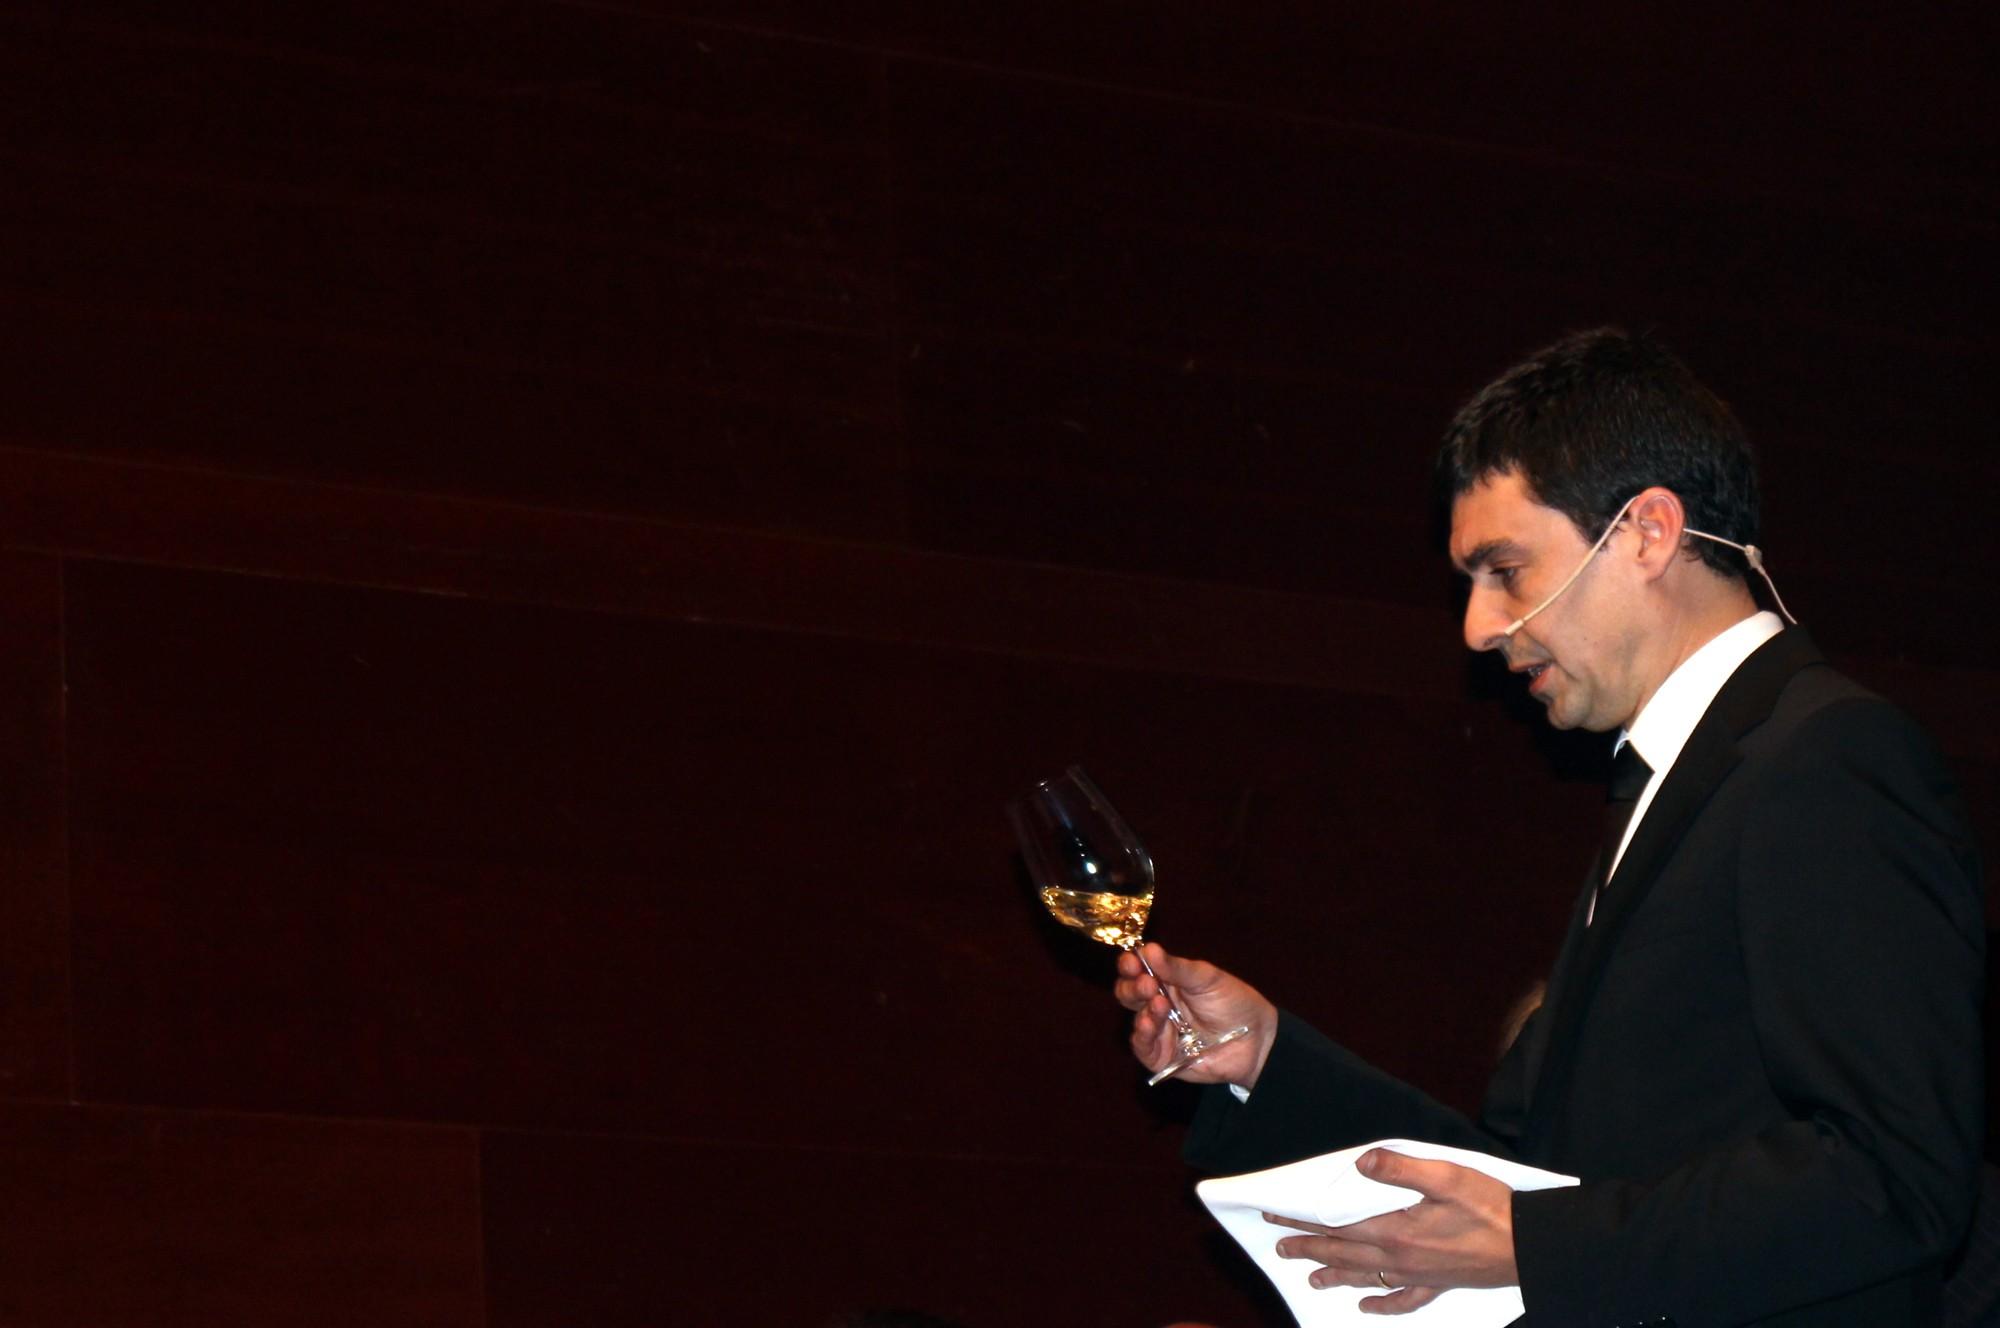 Sergi Figueras, Mejor Sumiller de España 2012